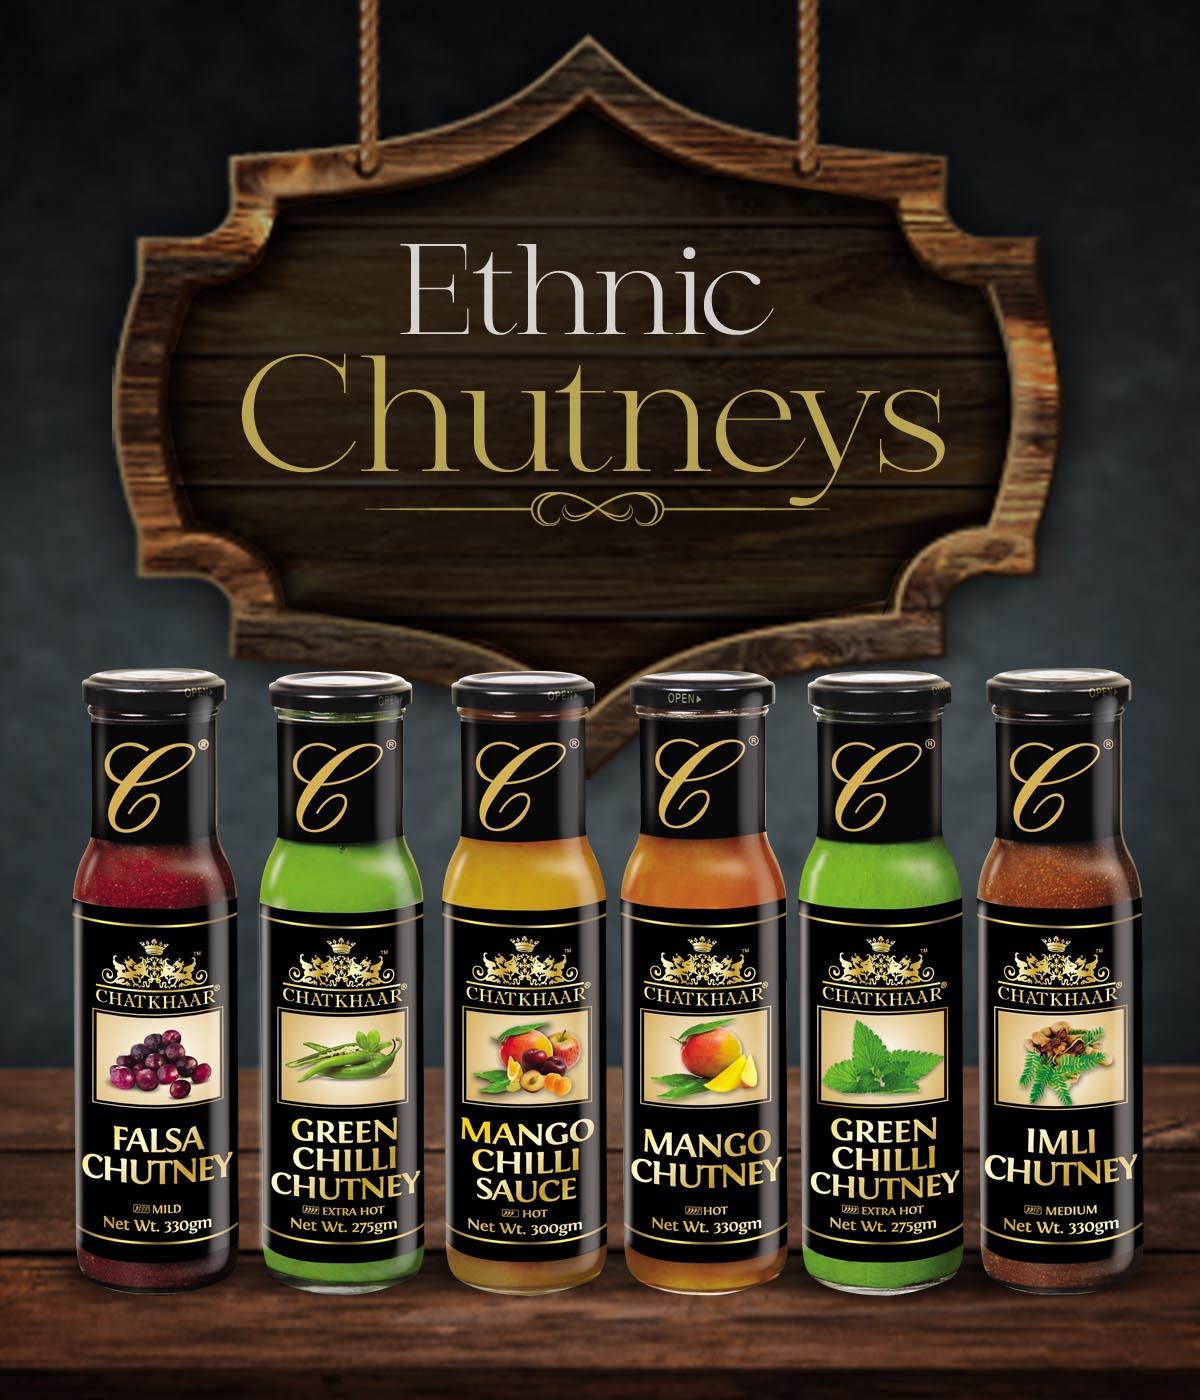 ethnic chutneys